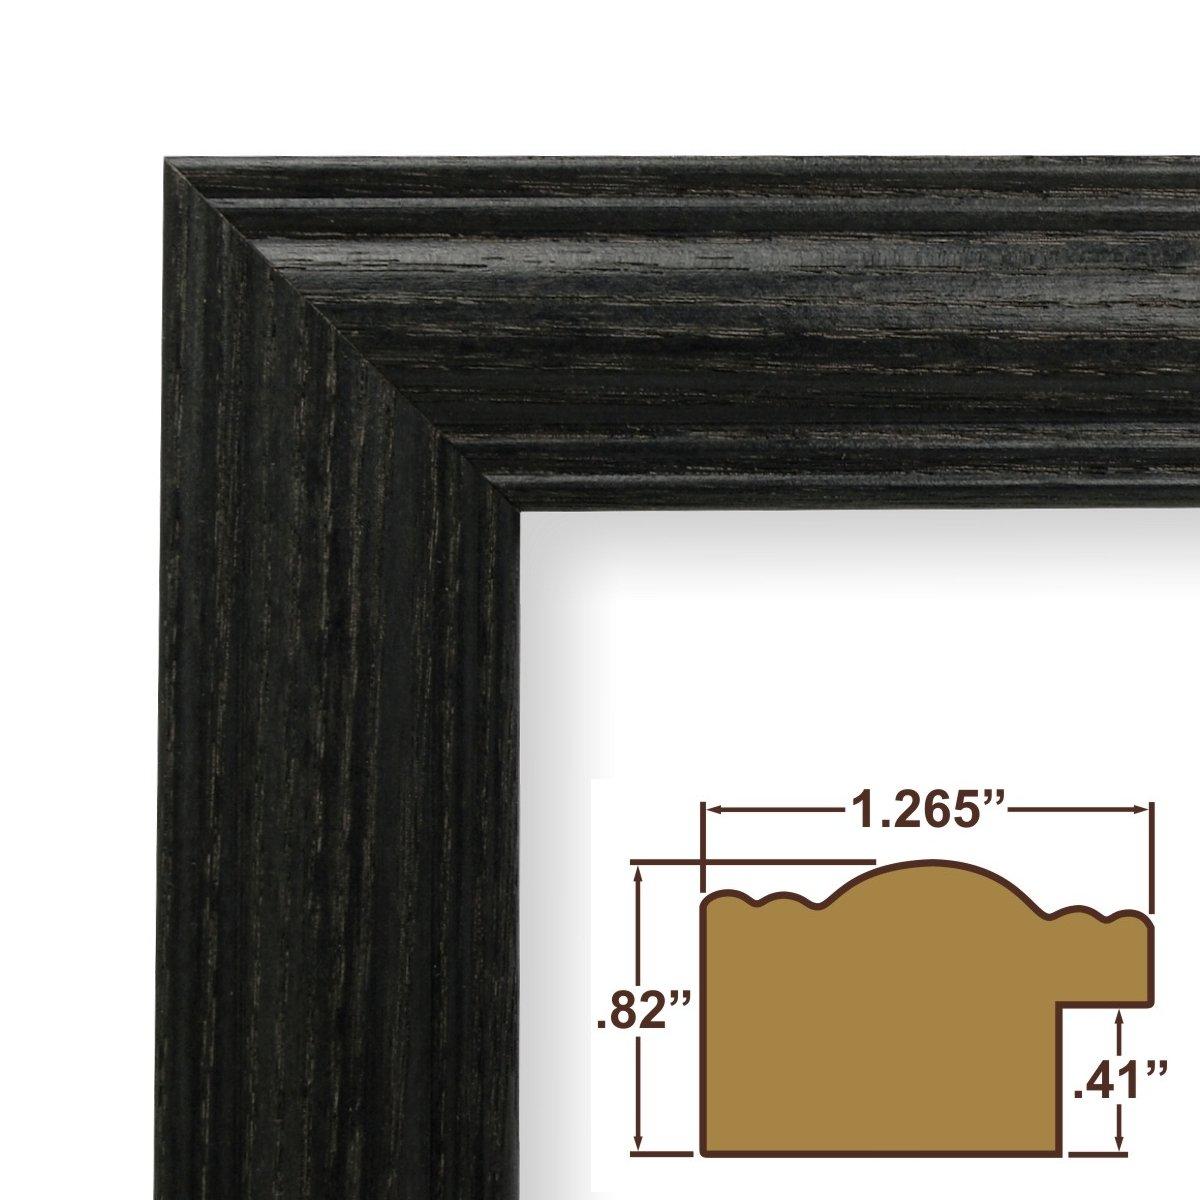 Amazon 24x28 picture poster frame wood grain finish amazon 24x28 picture poster frame wood grain finish 1265 wide black 440bk jeuxipadfo Gallery